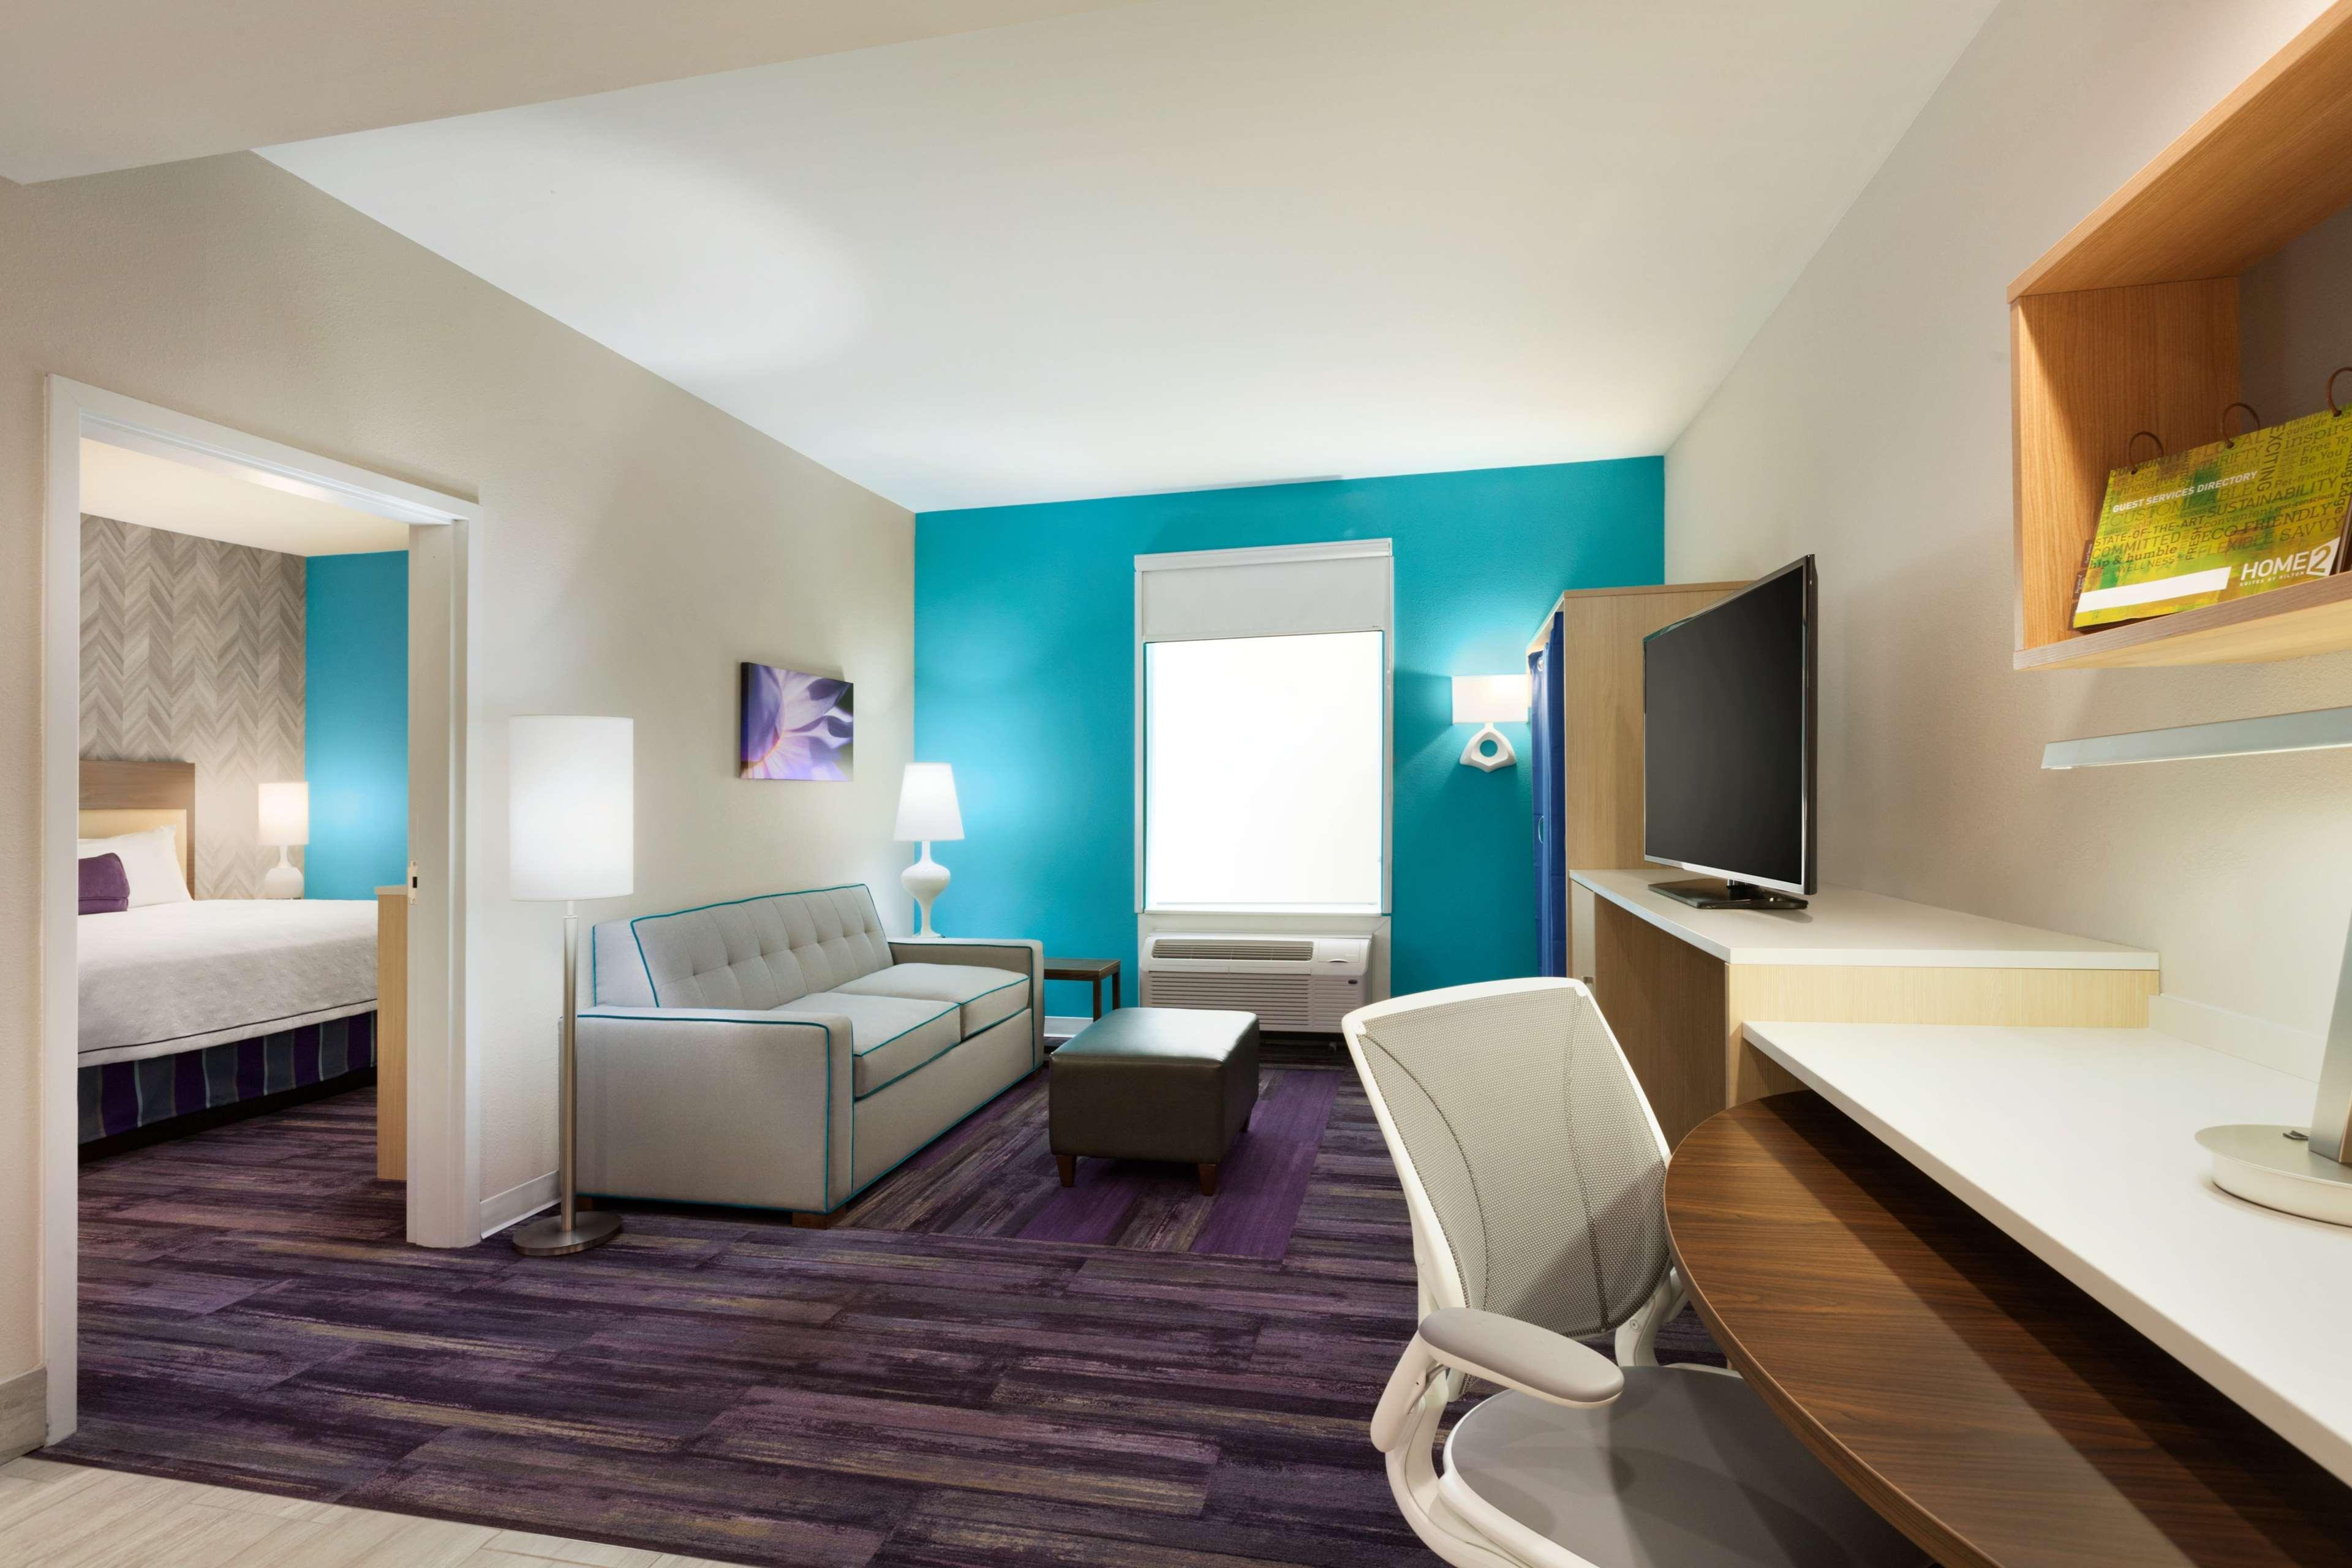 Home2 Suites by Hilton West Monroe image 12